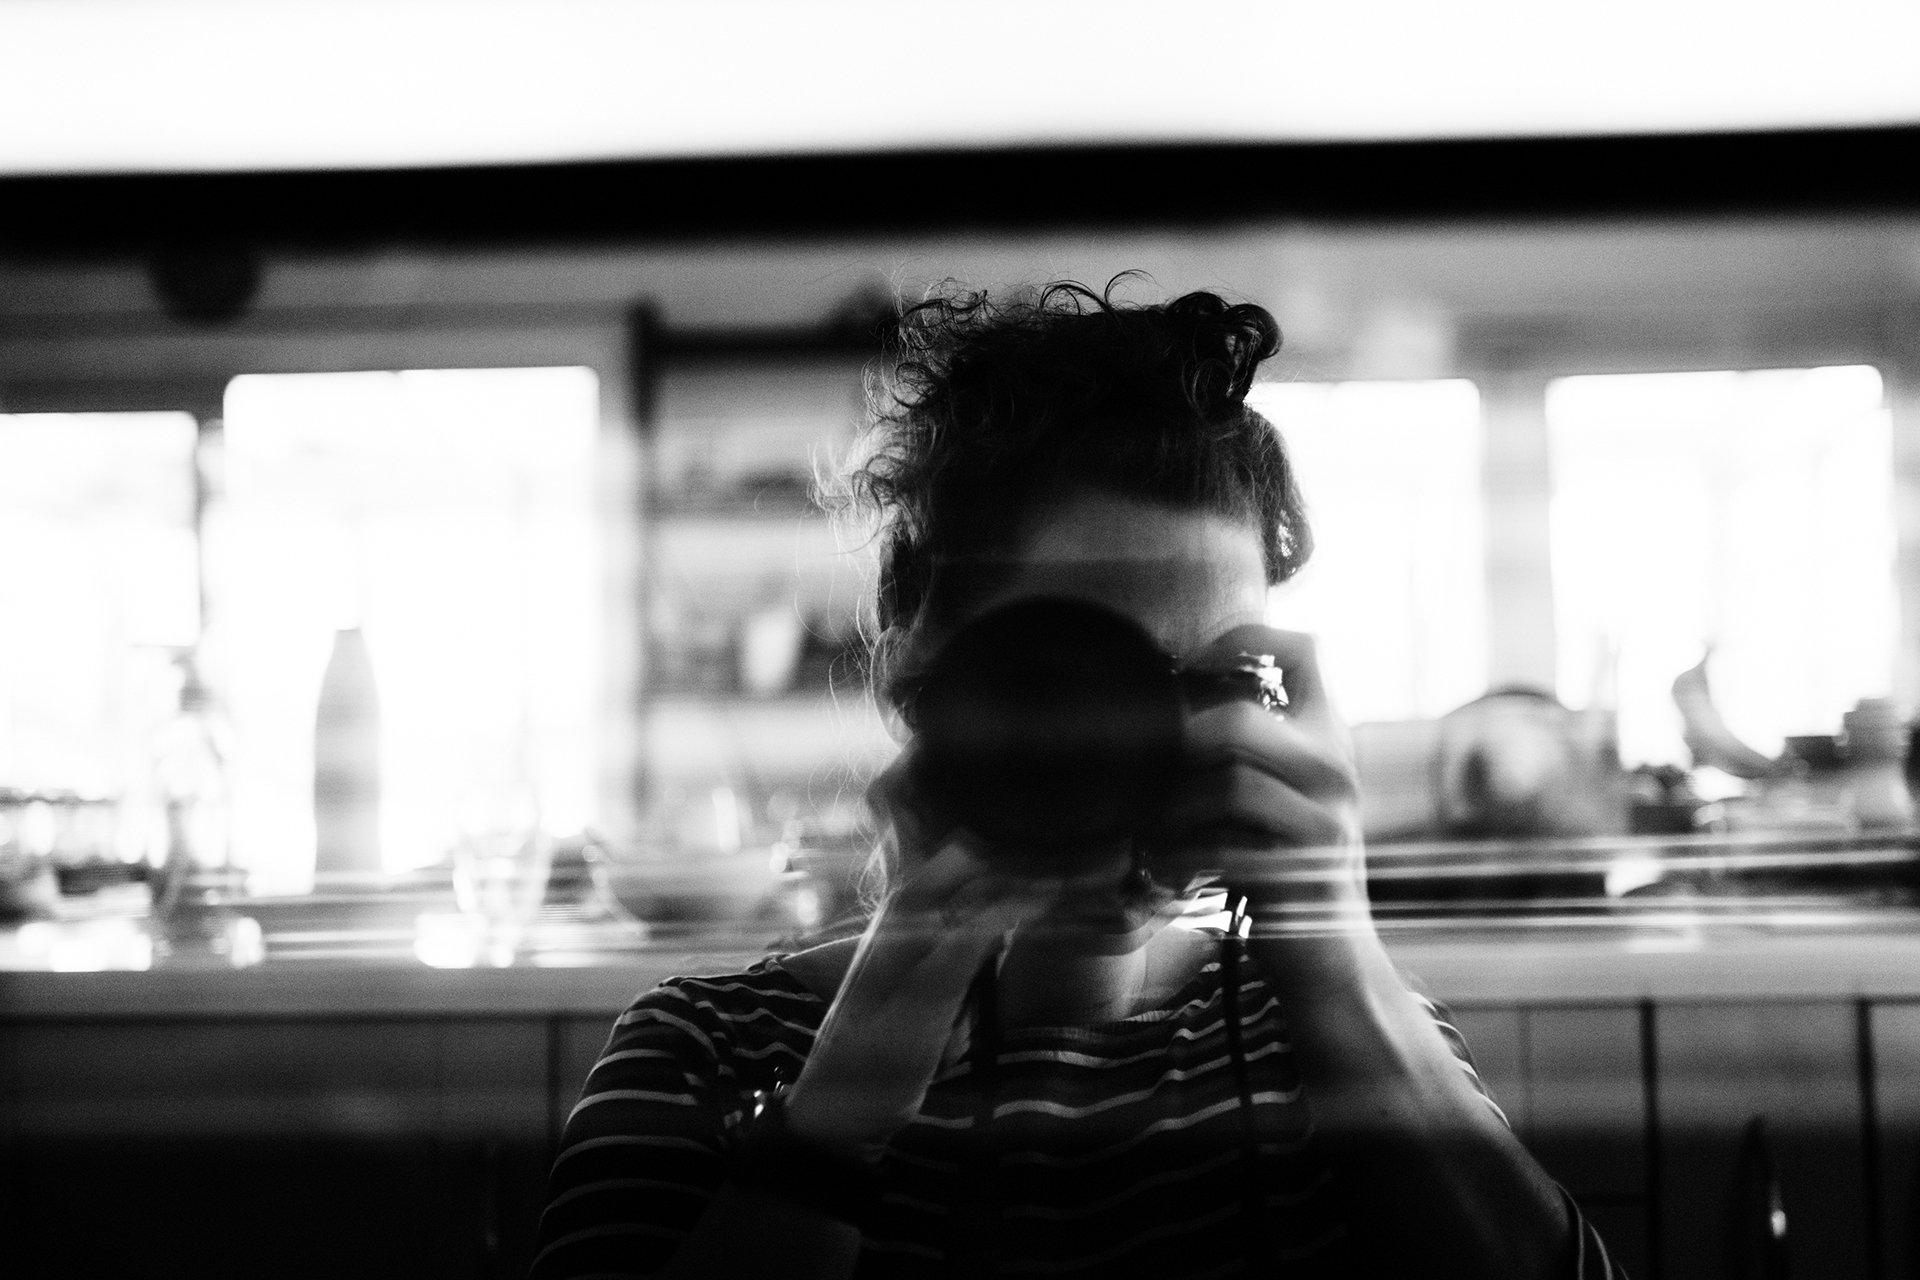 self portrait camera reflection